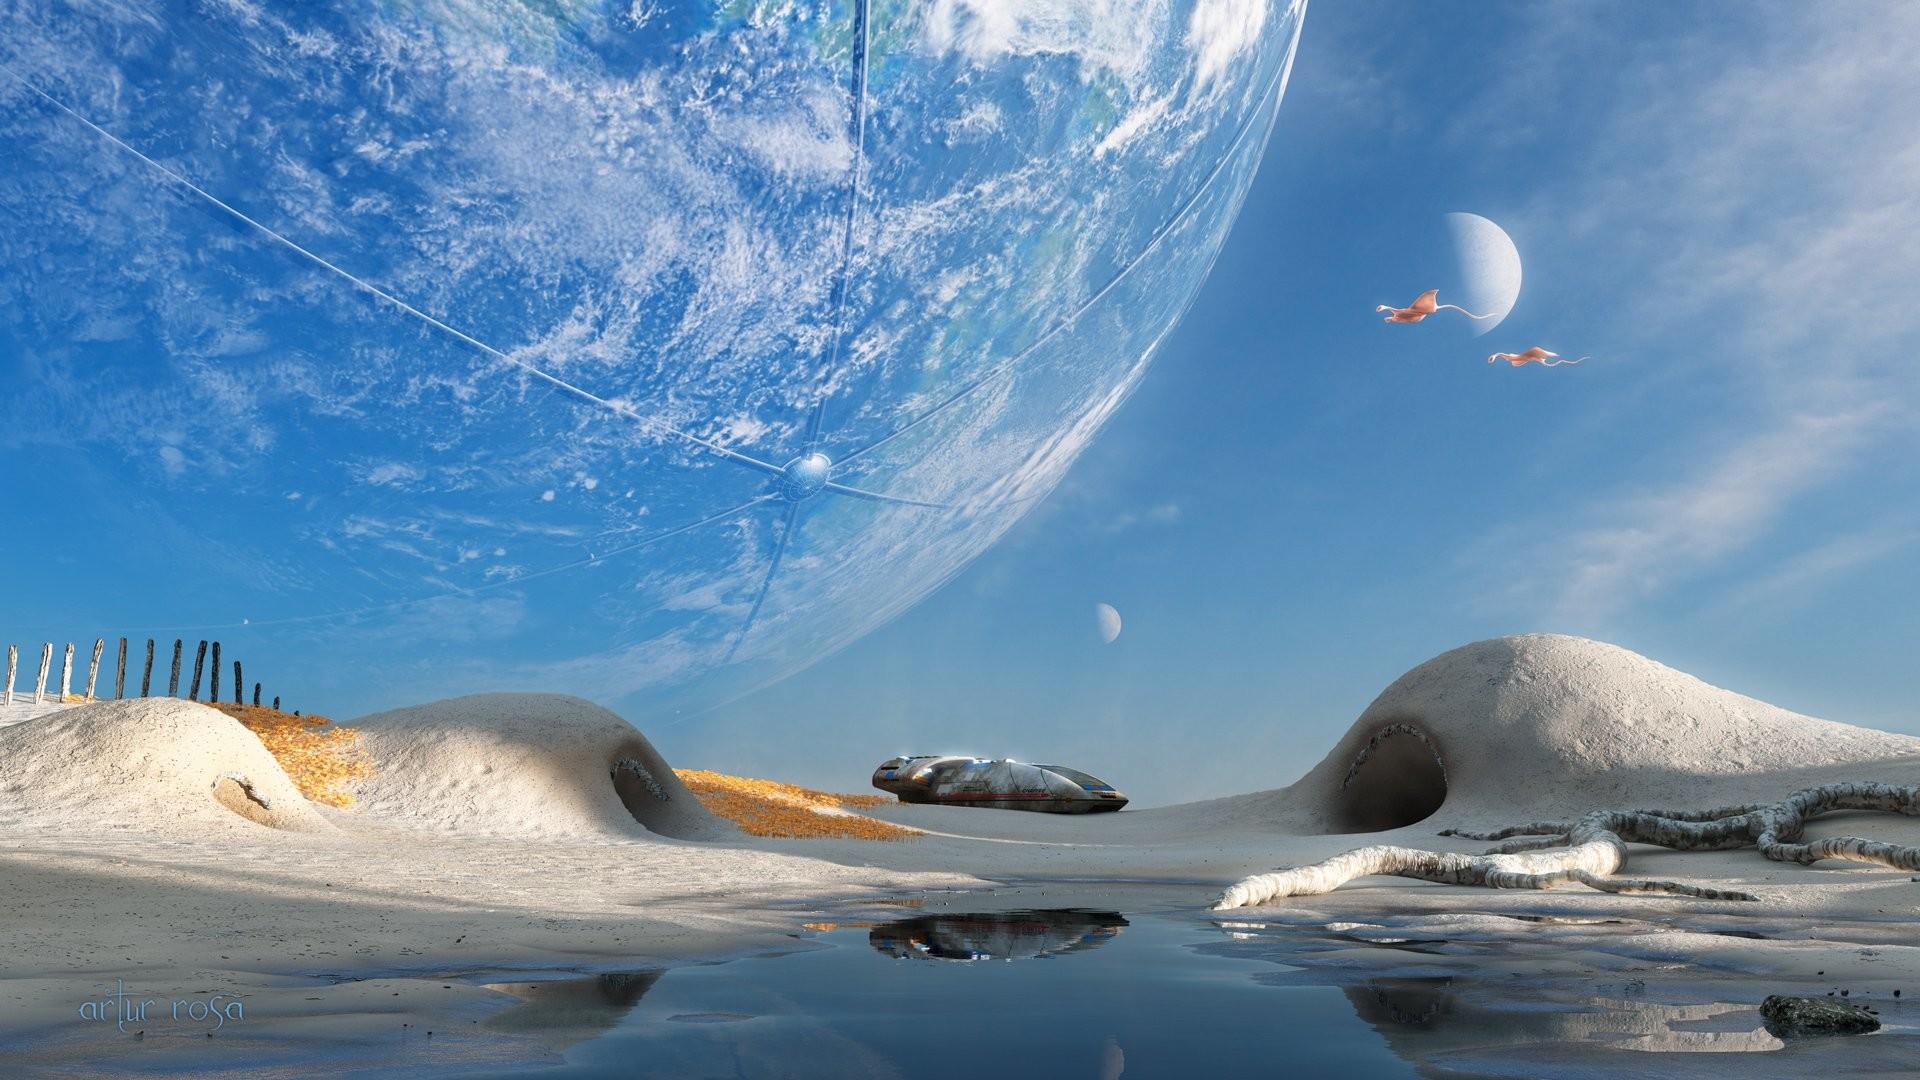 2560x2048 Sci Fi Landscape